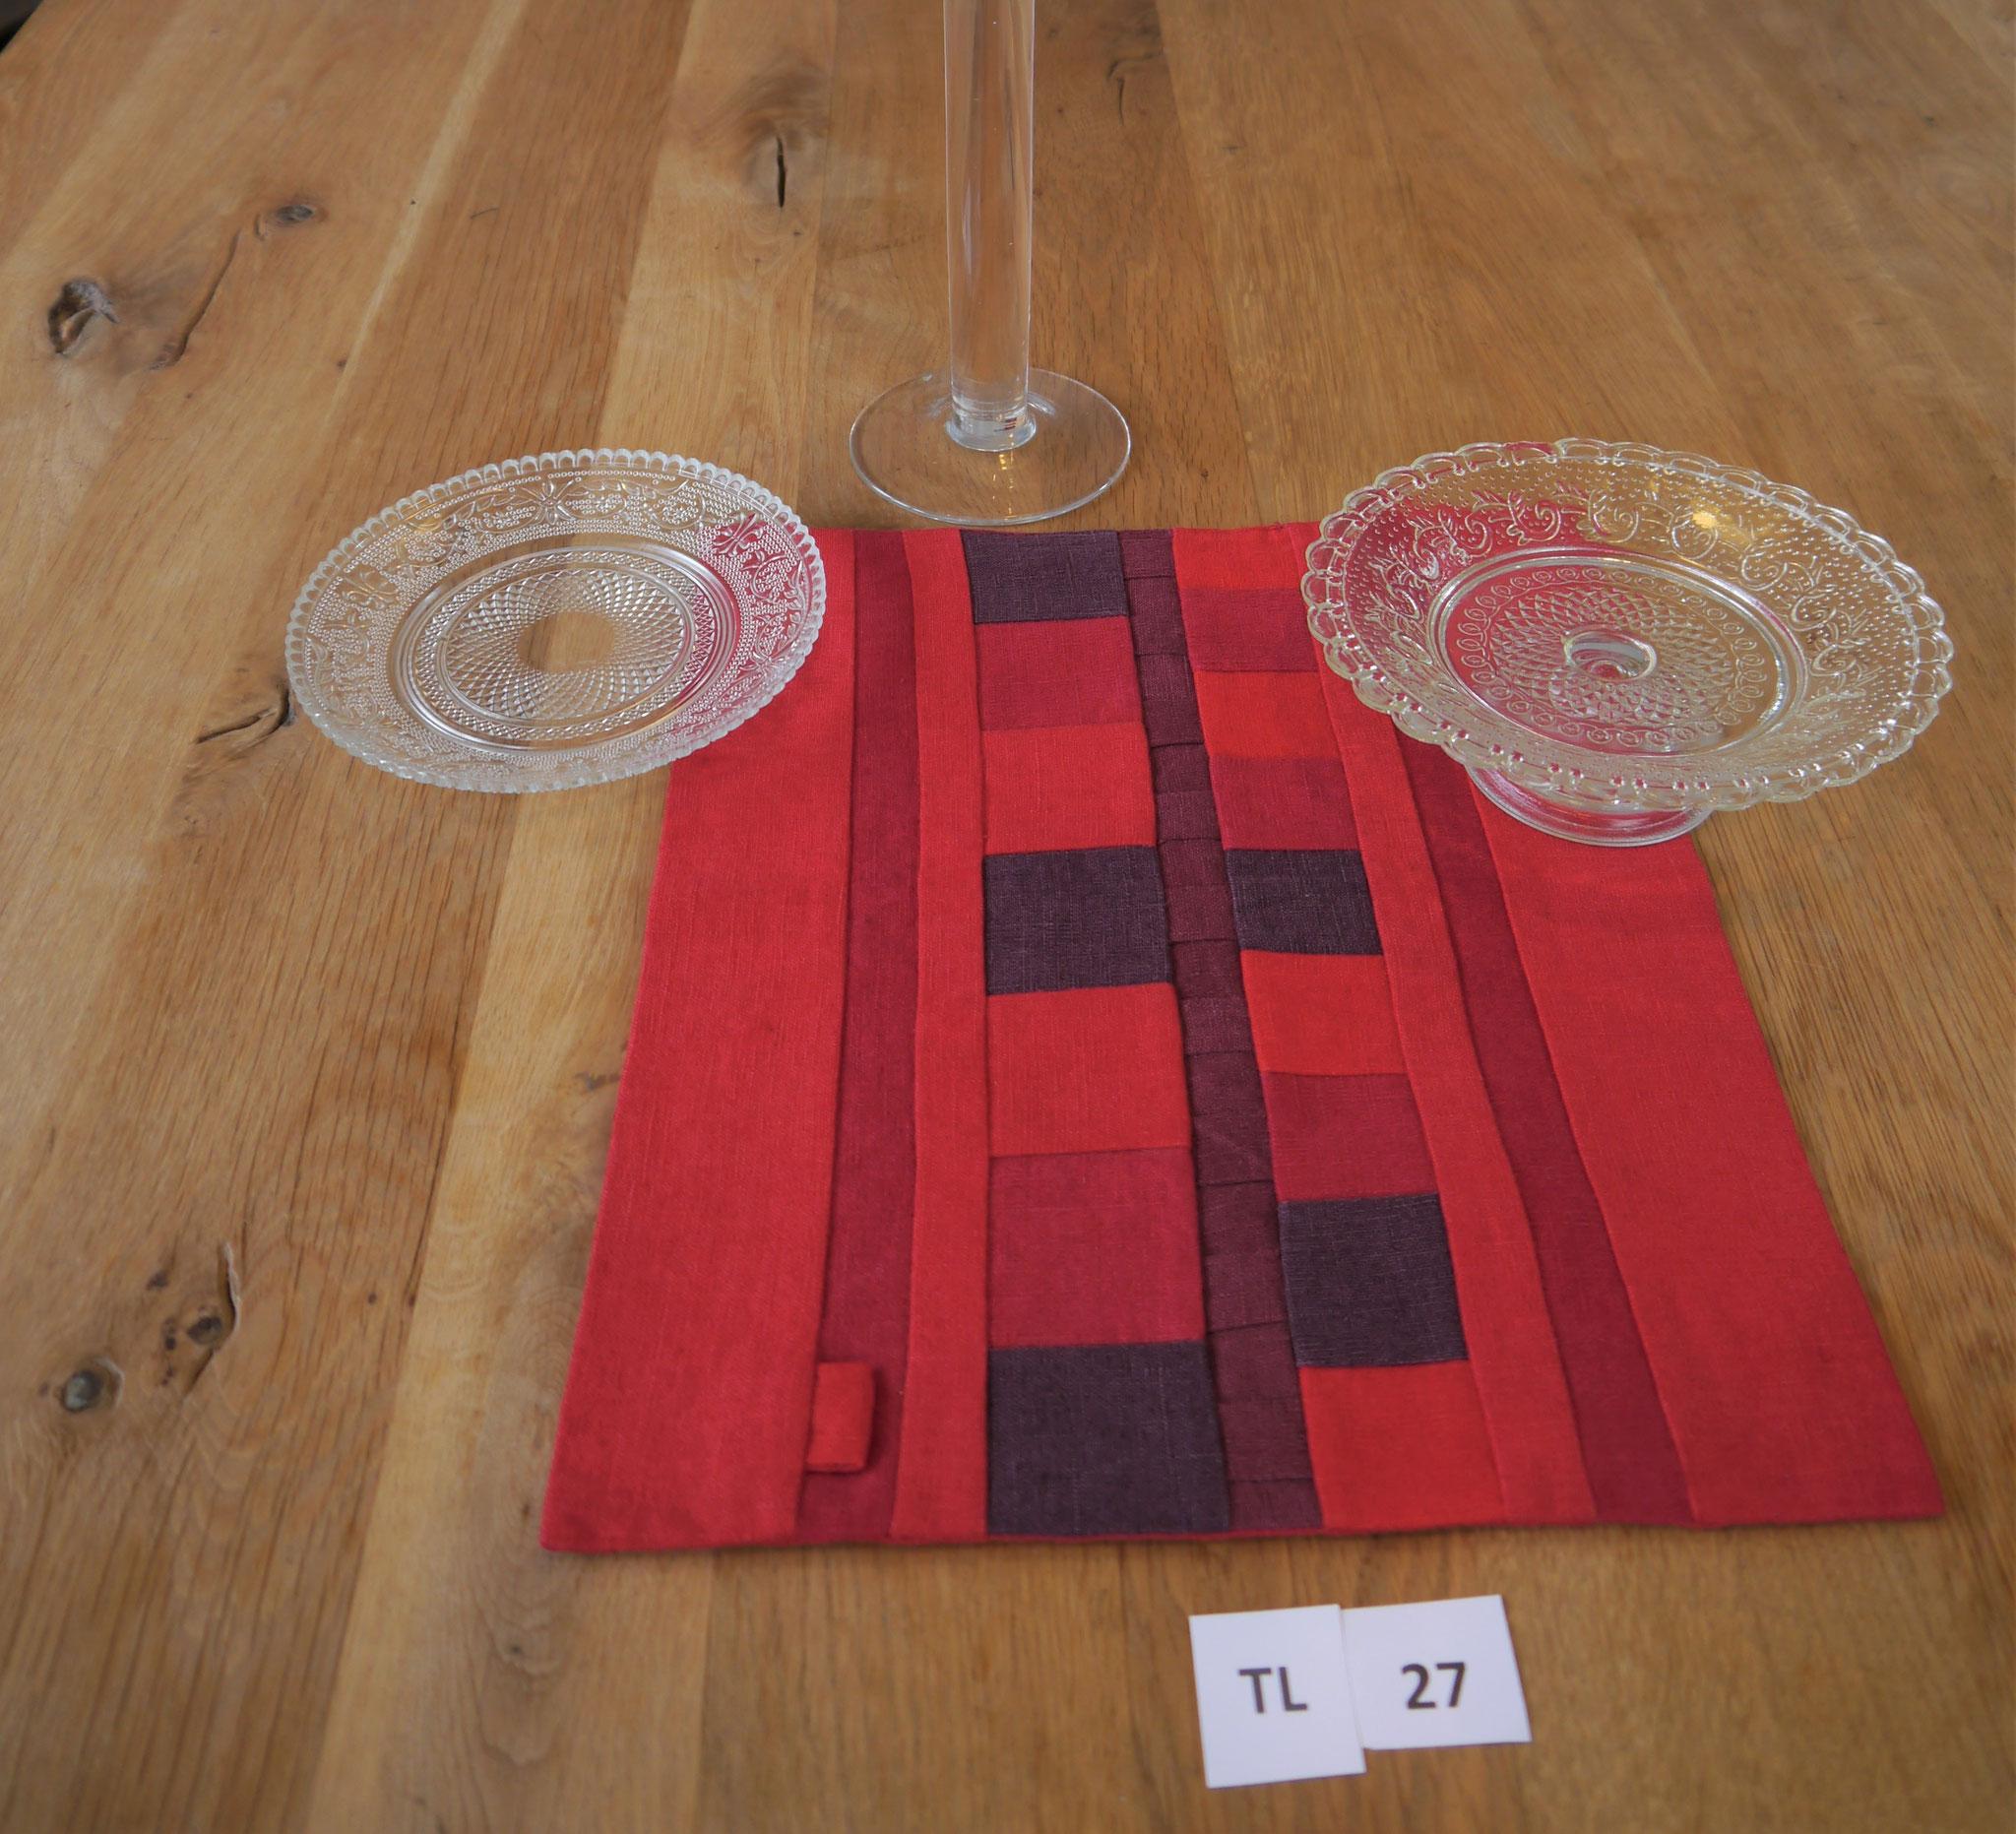 TL 27: 32 x 26 cm * Leinen * 24,90 €